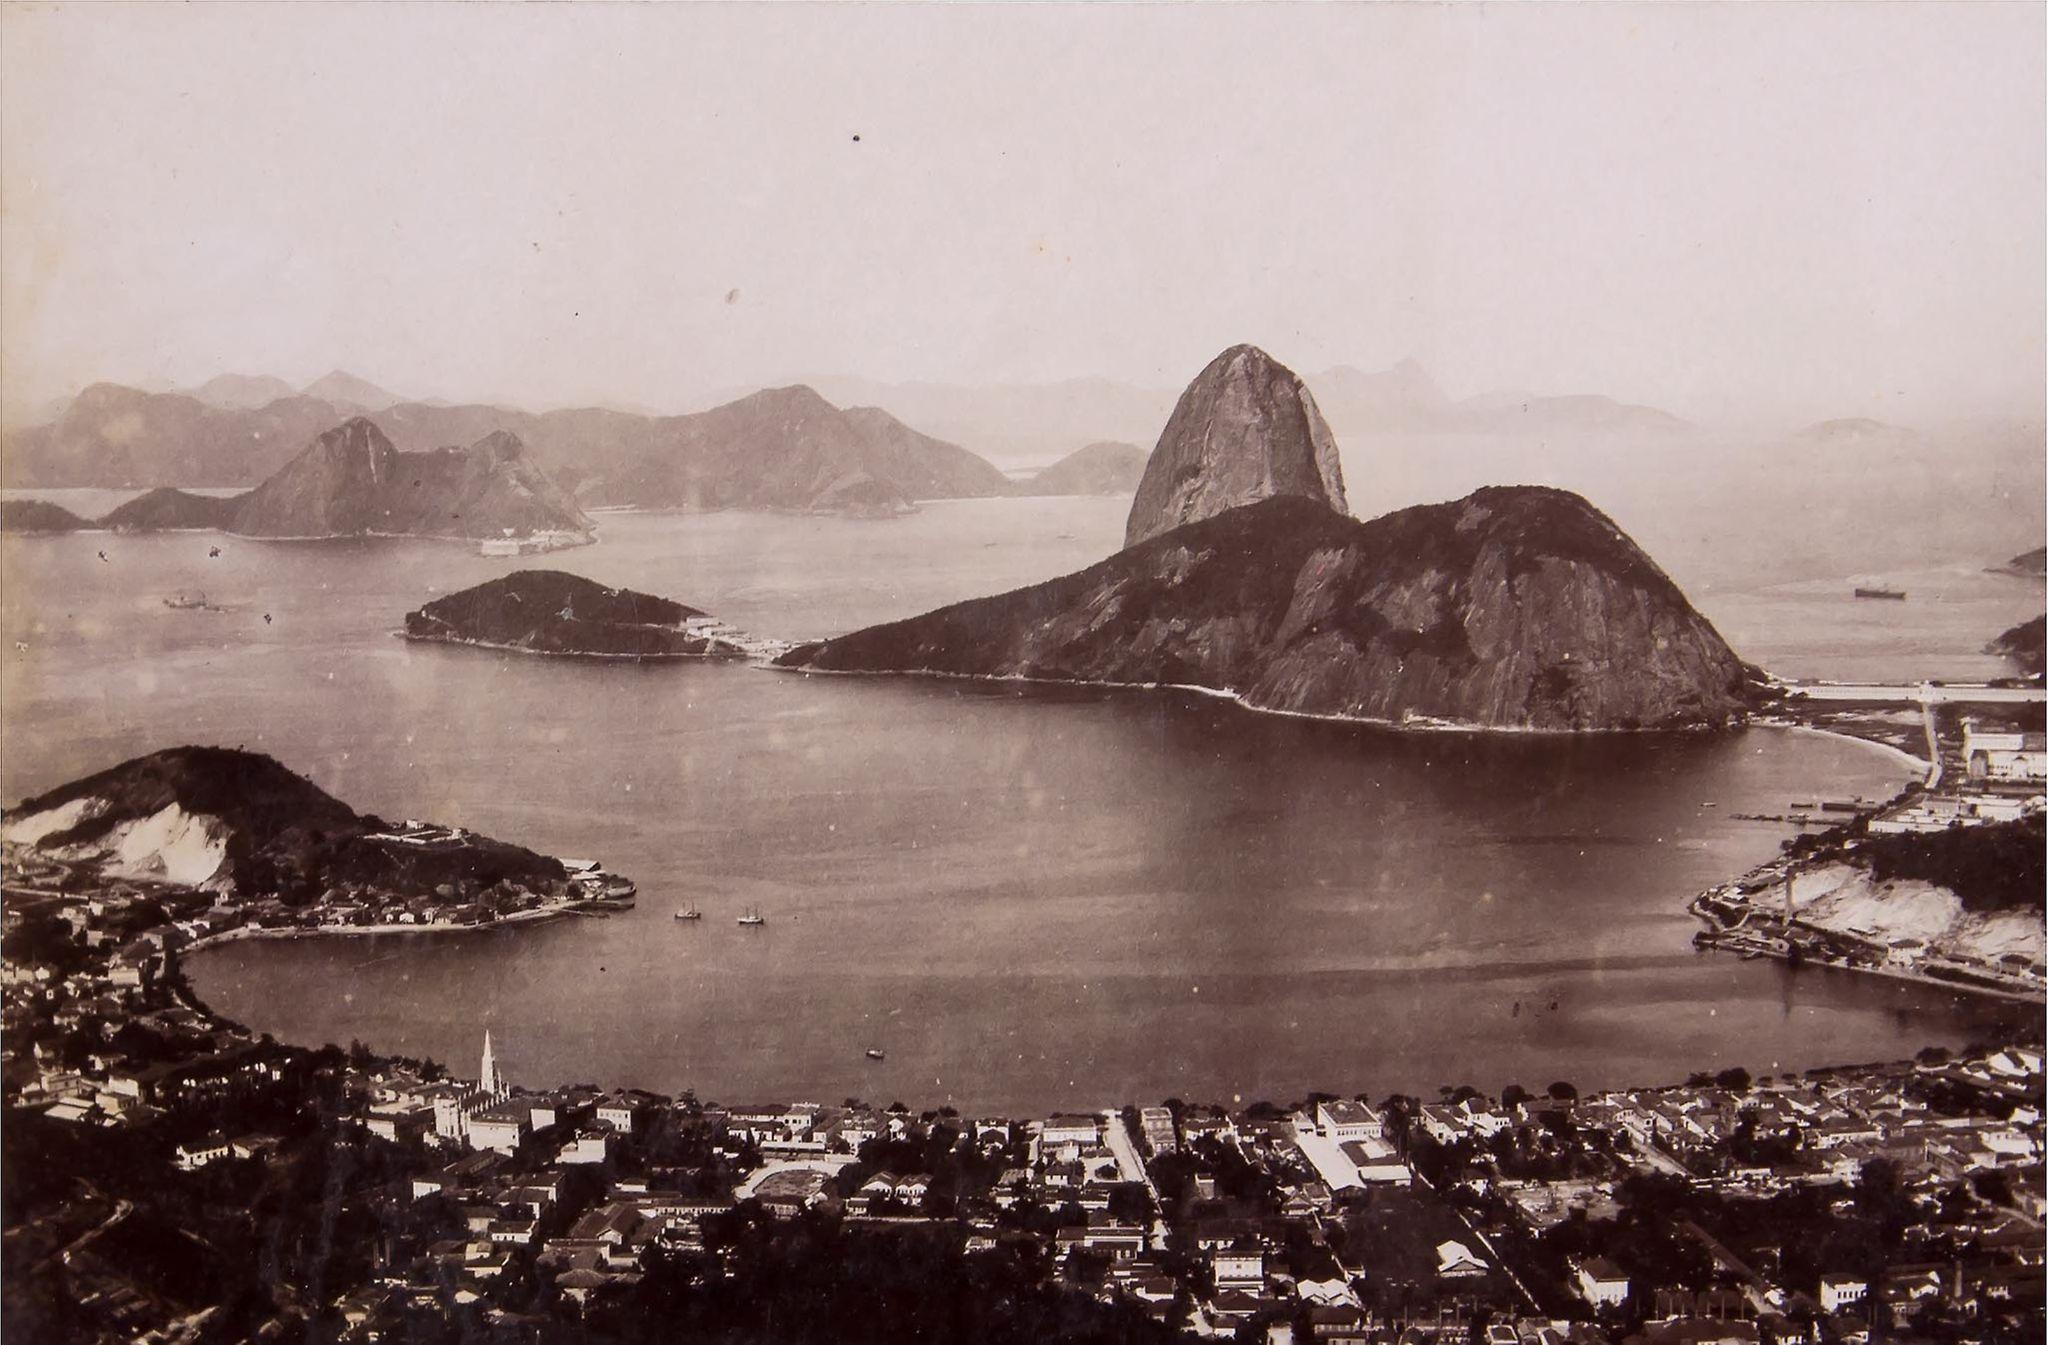 Rio de Janeiro, Brasil, photographed by Marc Ferrez, circa 1880.